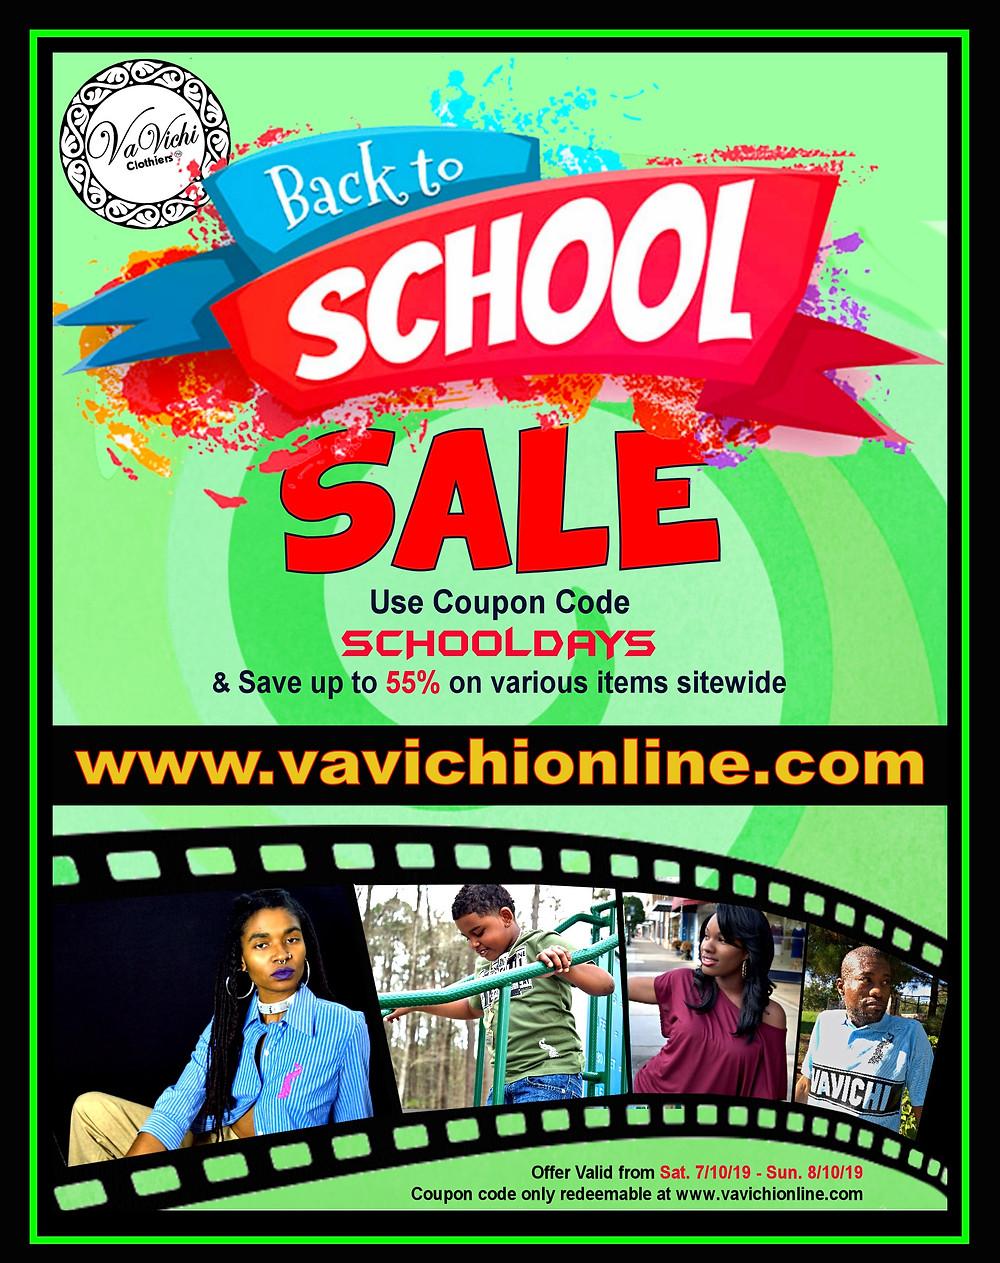 VaVichi Back to School Sale